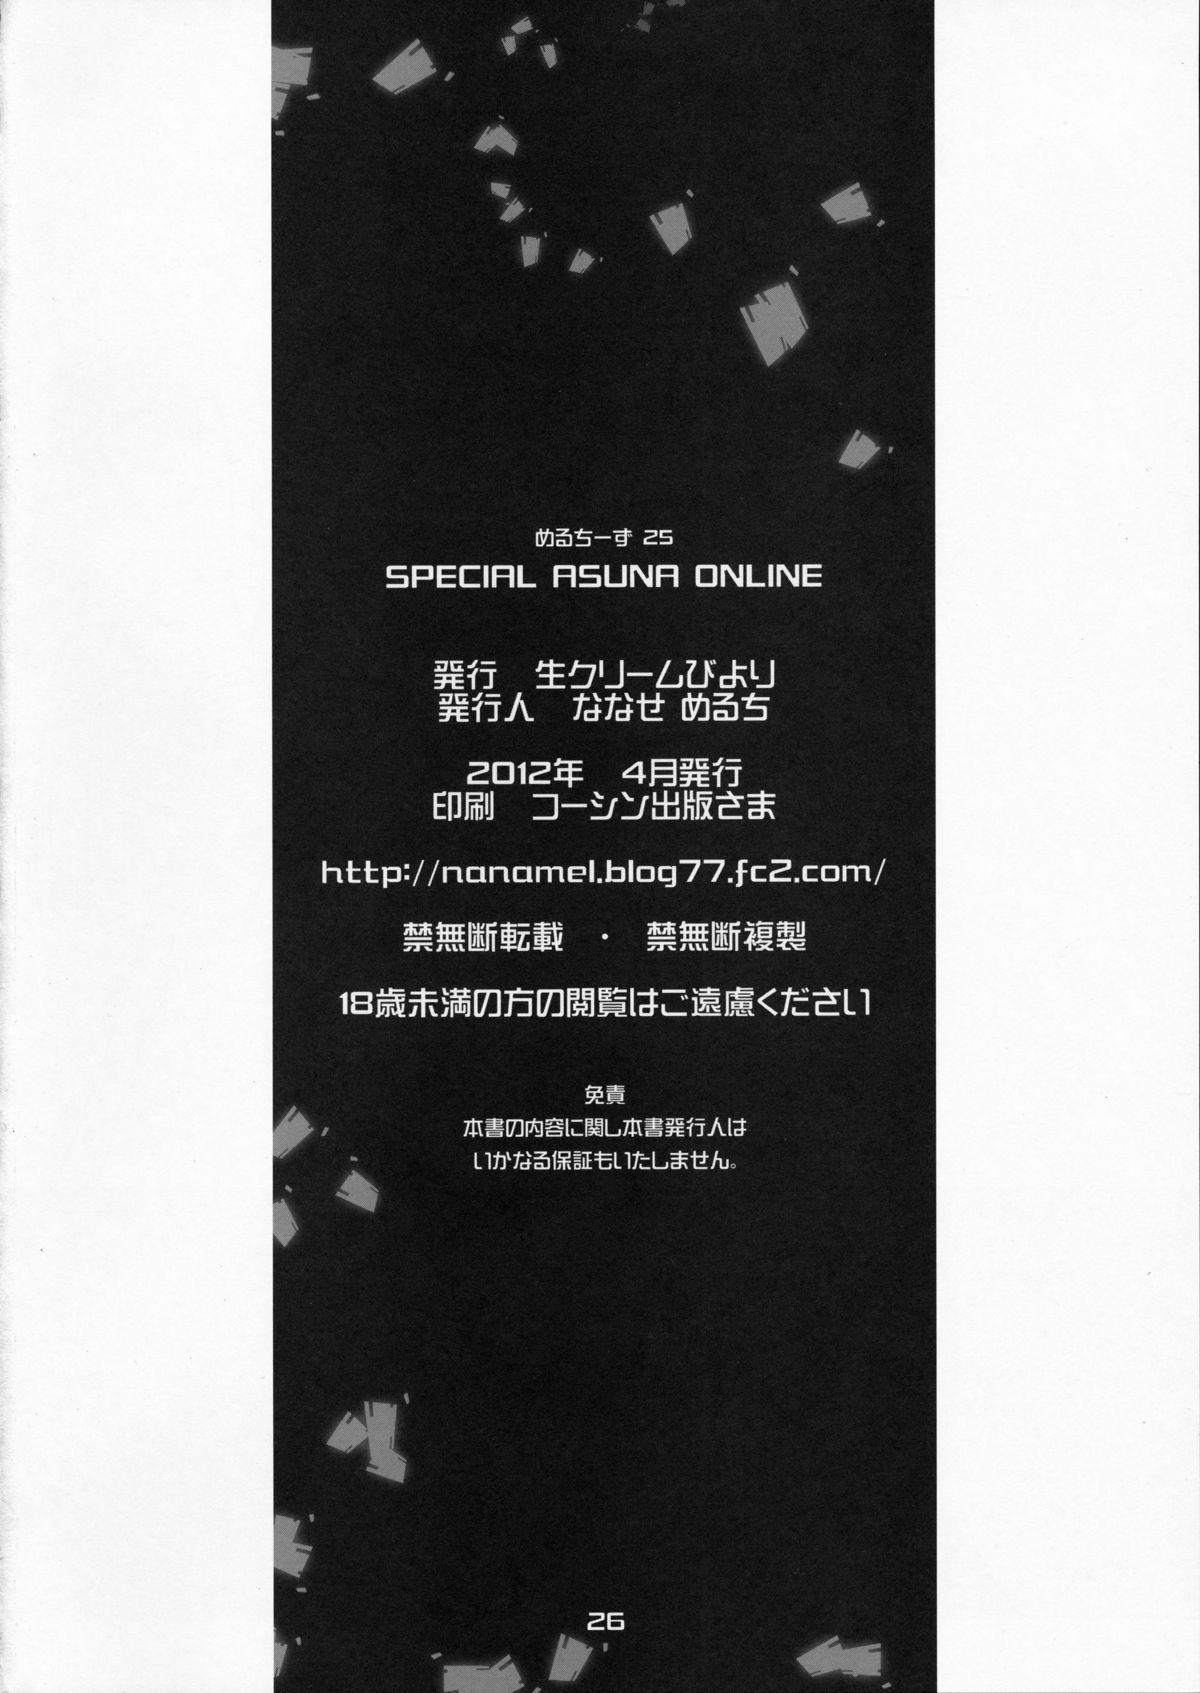 SPECIAL ASUNA ONLINE 25